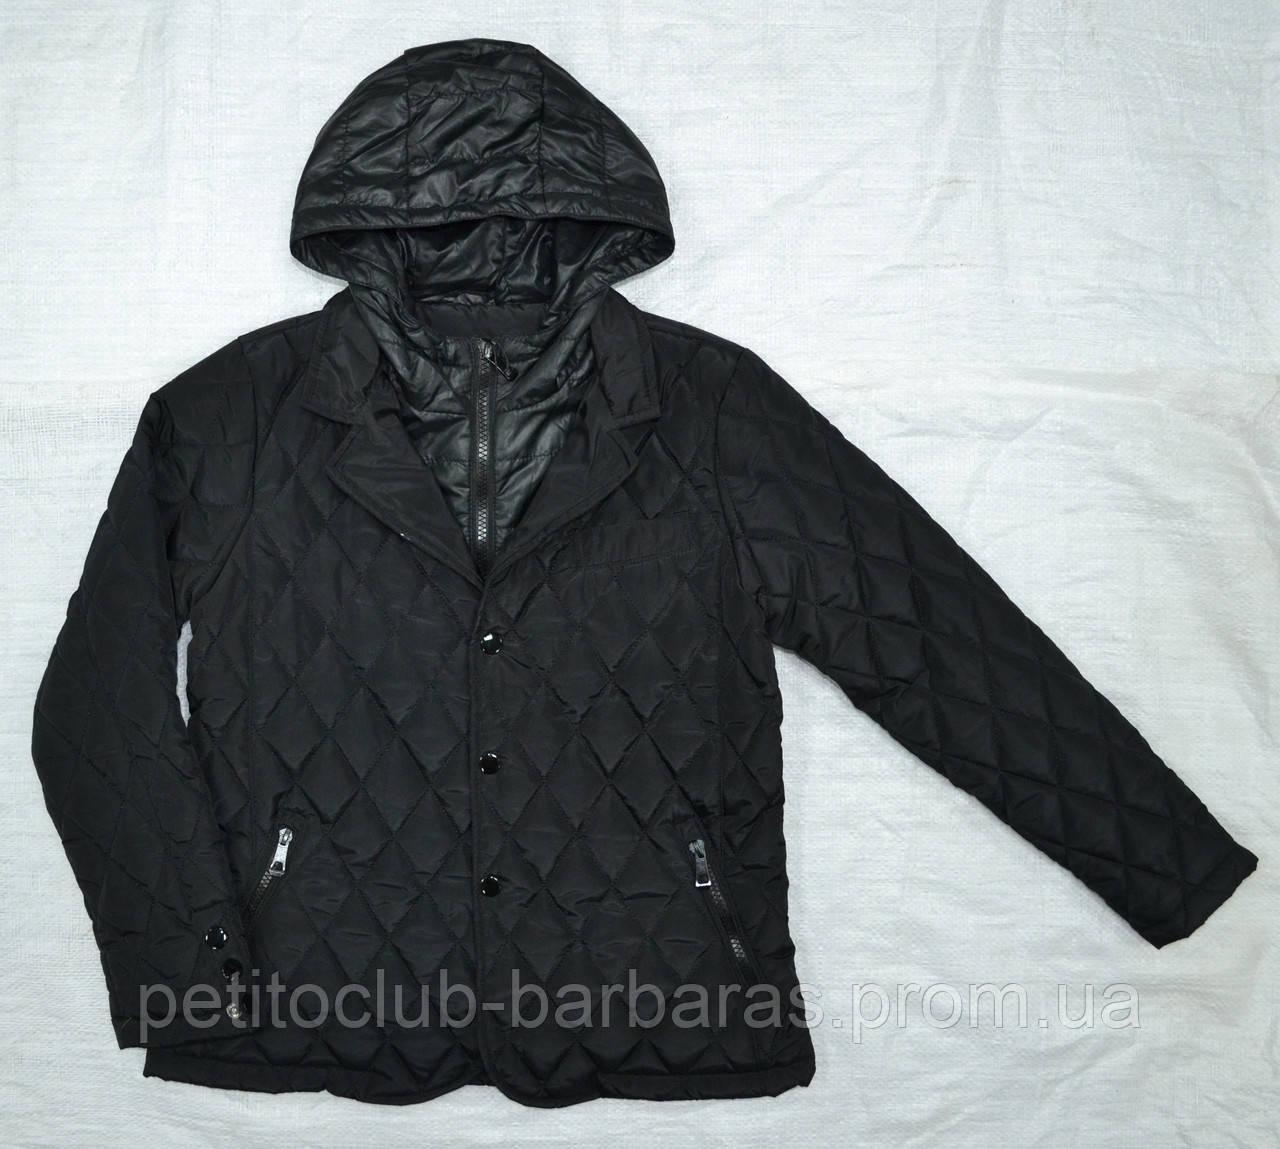 Куртка демисезонная для мальчика Seagull NEW'S черная (Seagull, Венгрия)